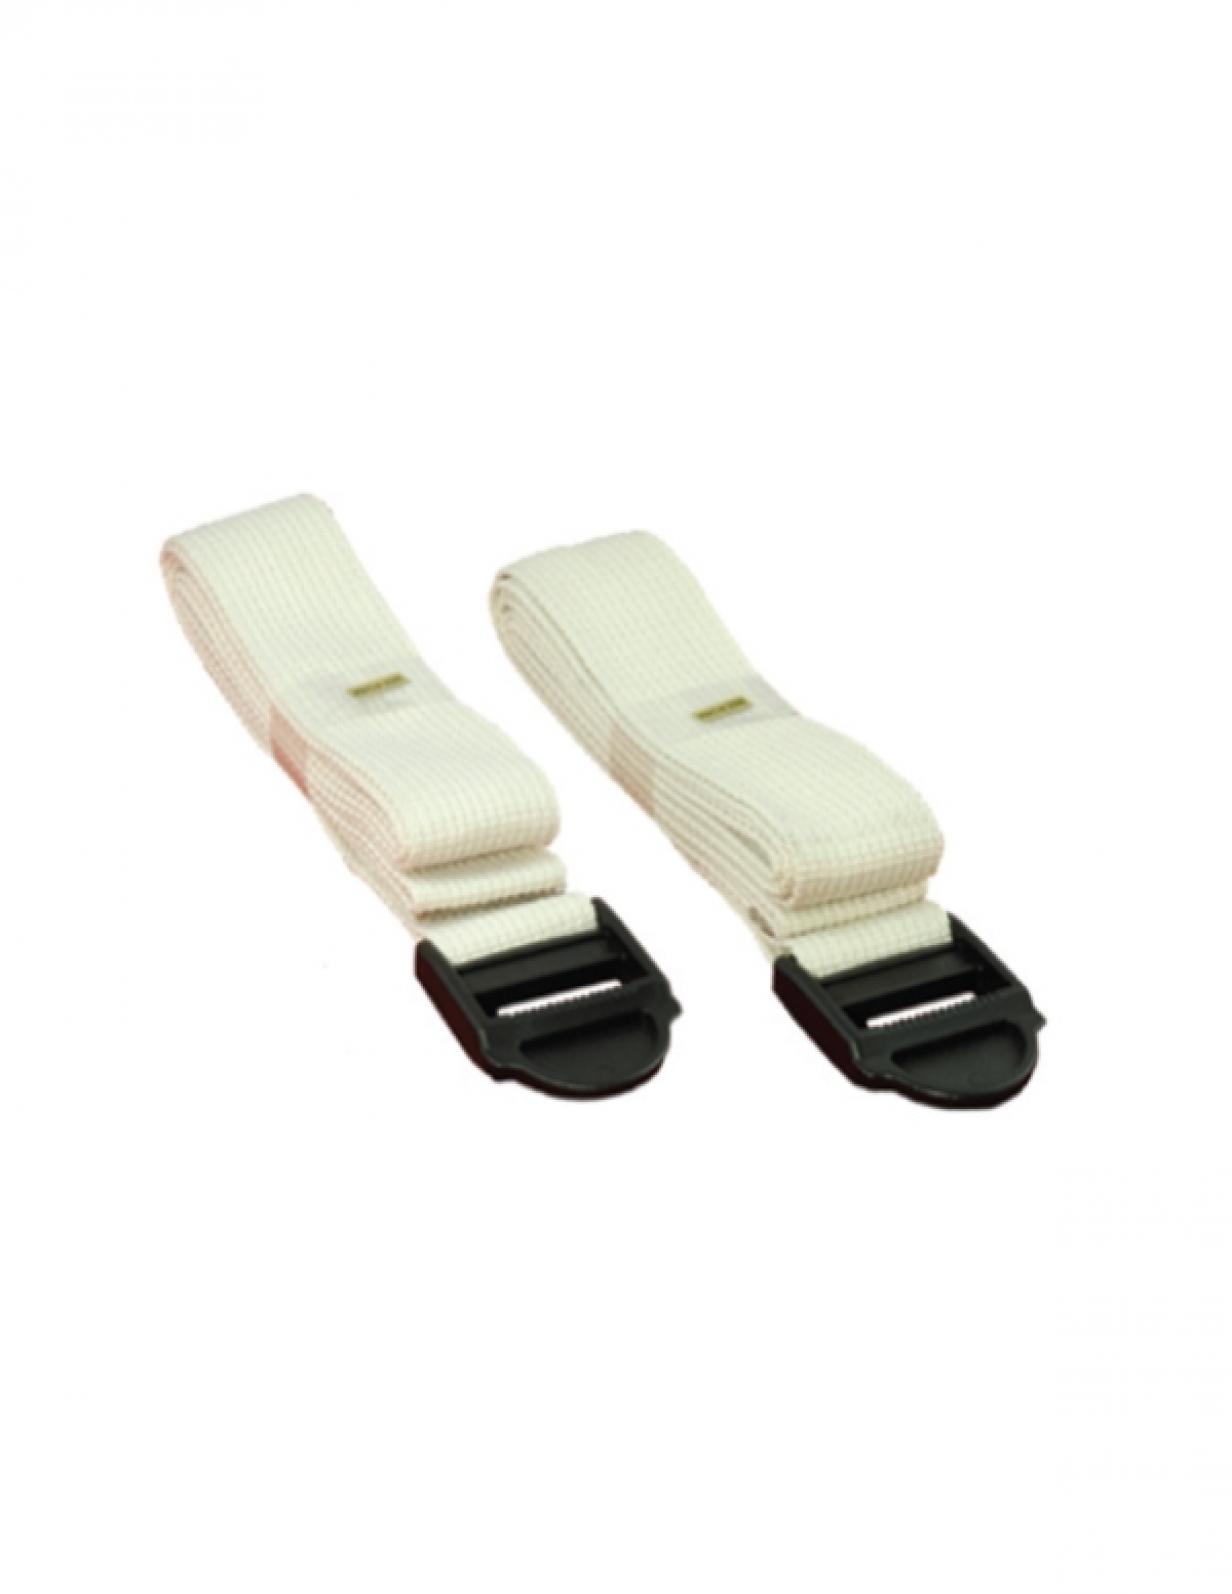 W2725 Yoga Strap Polyester 183*3.8Cm